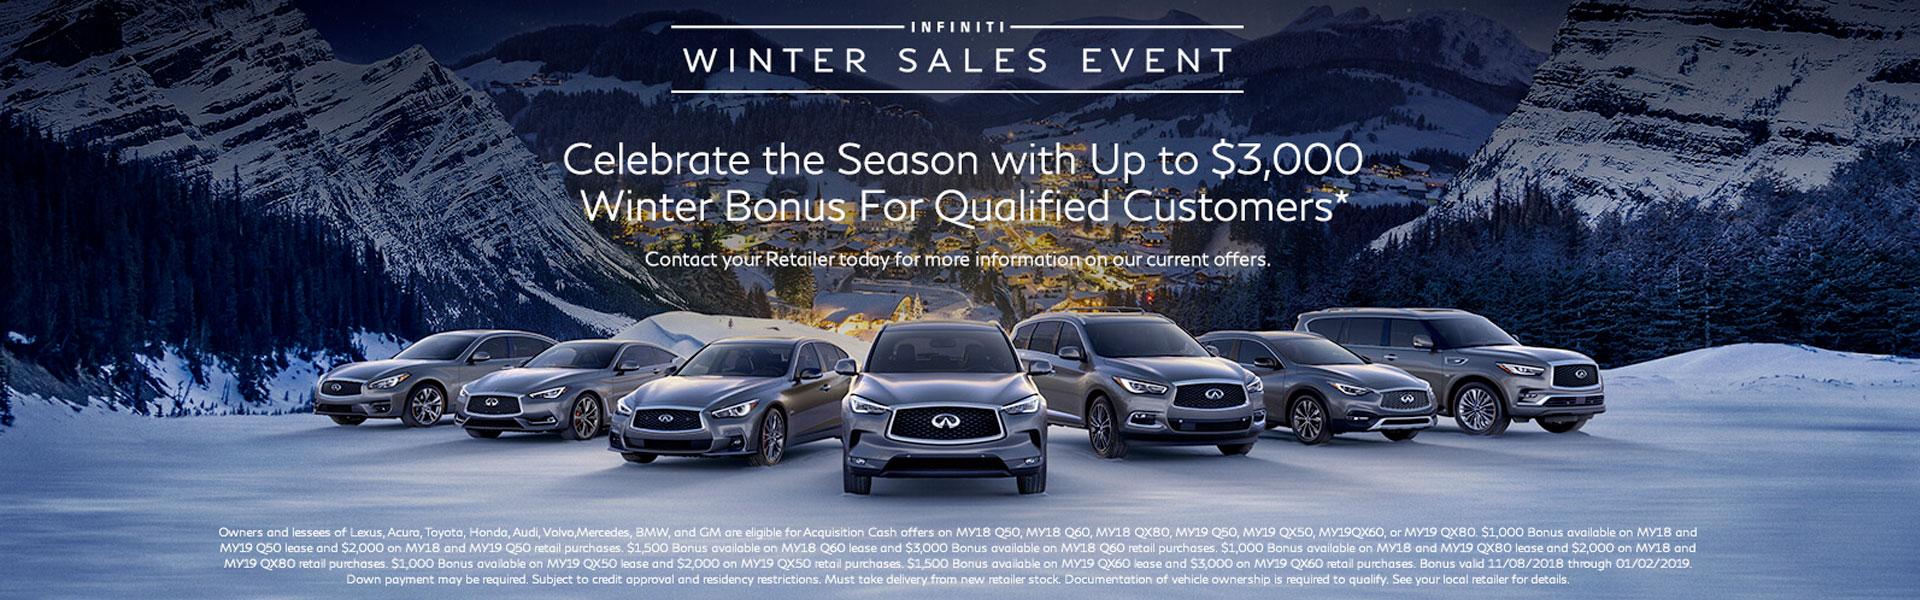 2018 Winter Sales Event